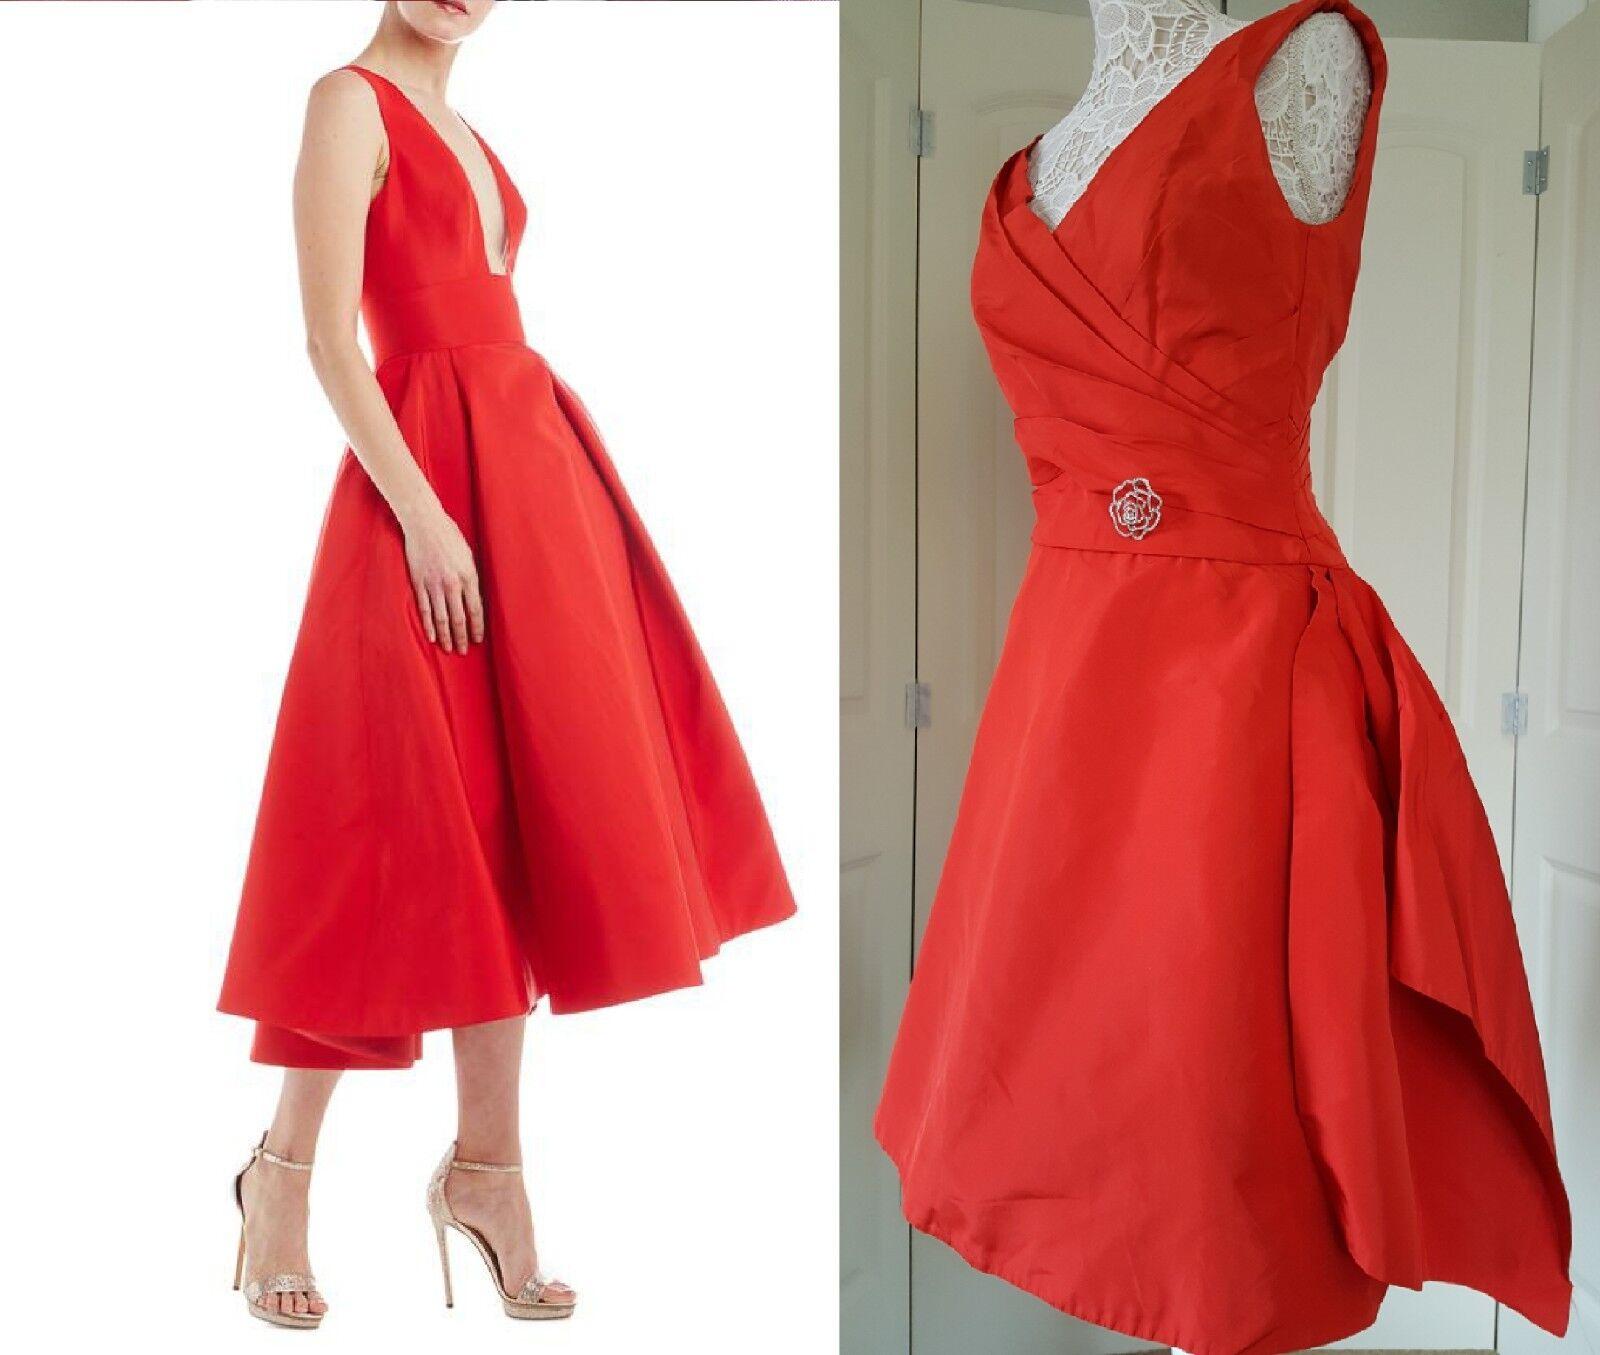 2595 MONIQUE LHUILLIER CORAL RED GORGEOUS TAFFETA  SILK DRESS GOWN RUNWAY 12